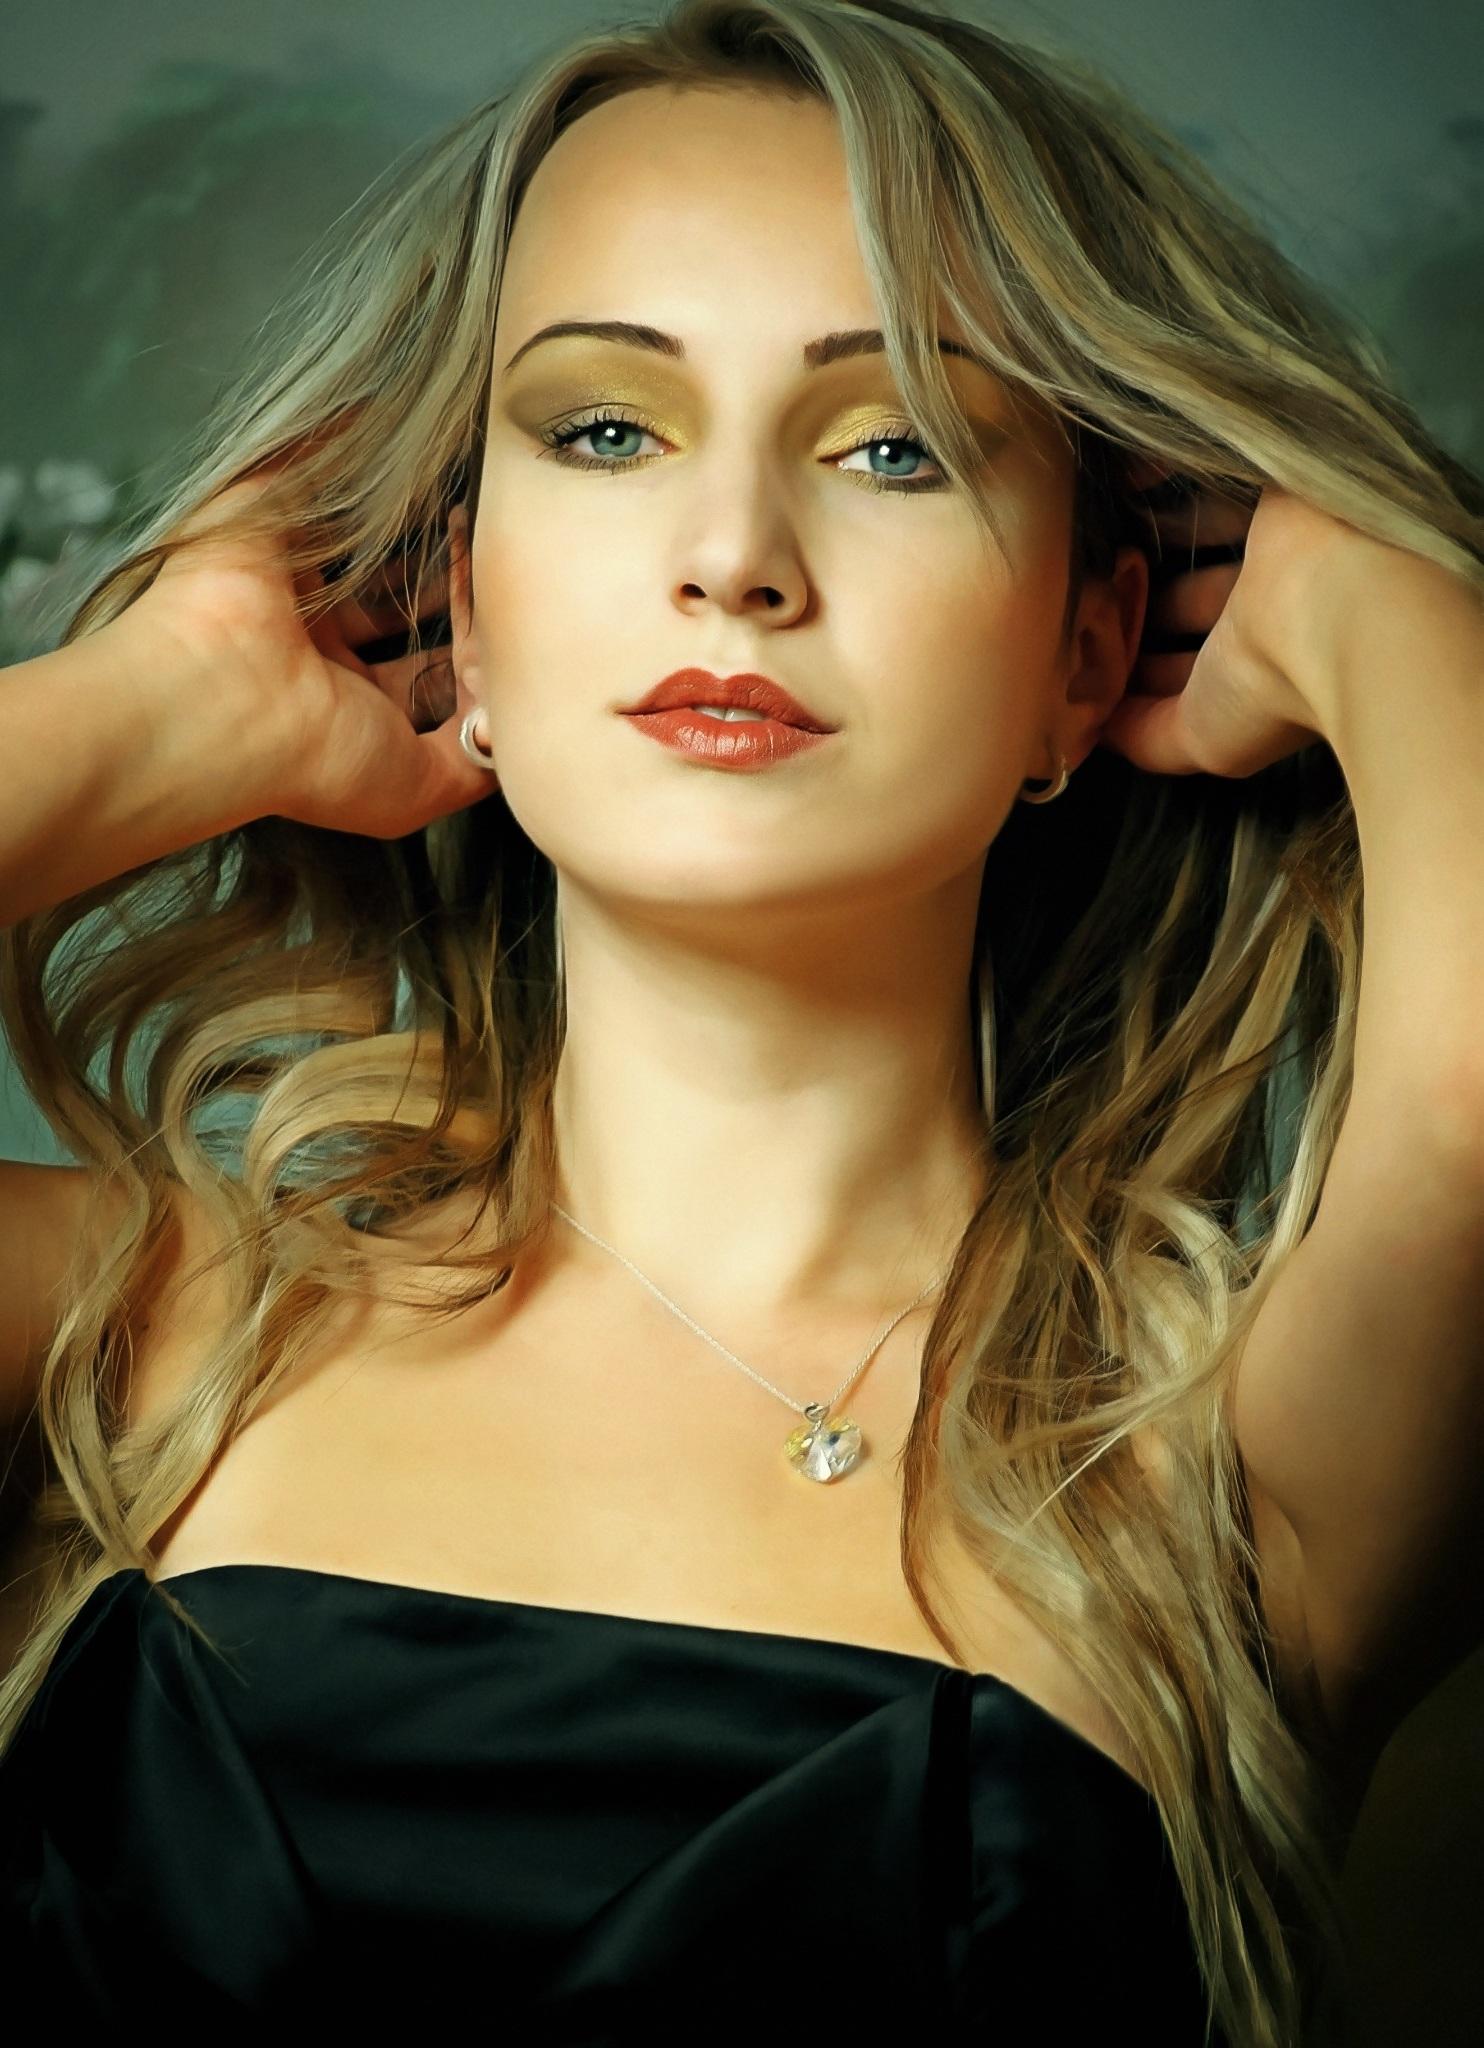 fotos gratis persona nia mujer cabello fotografa cadena modelo moda dama rubia peinado pelo largo cabello negro cara ojos figura ojo